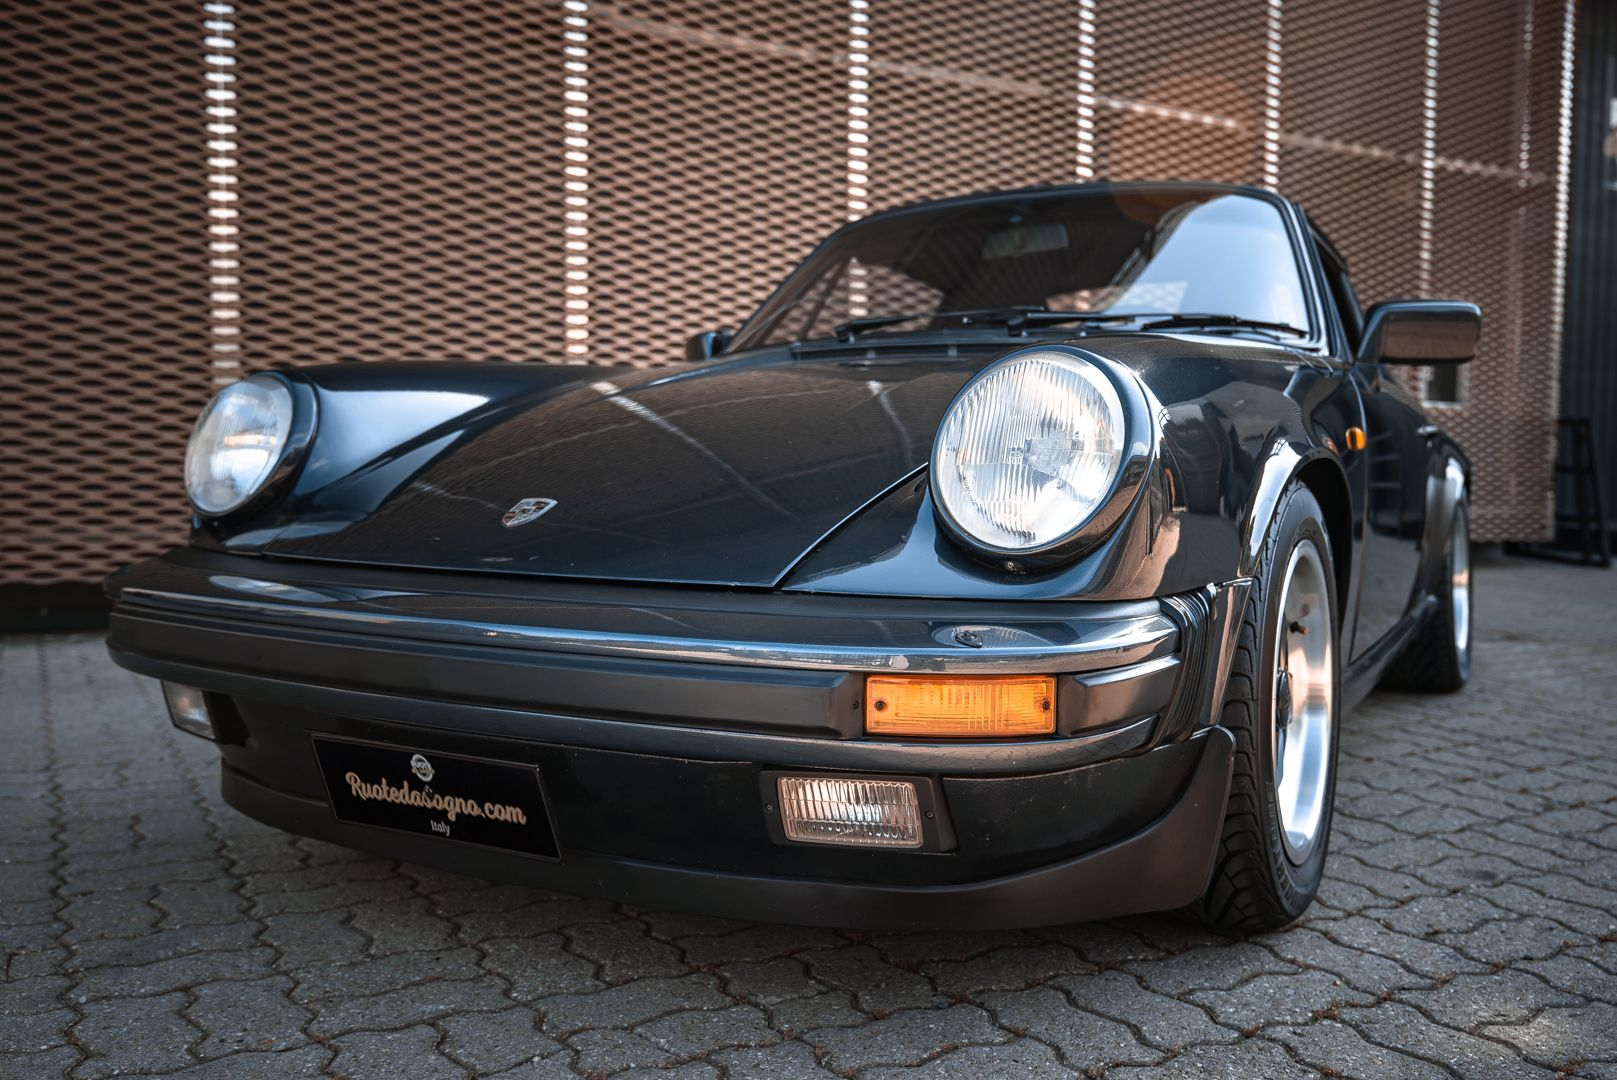 1986 Porsche 911 Carrera 3.2 Cabrio 70891